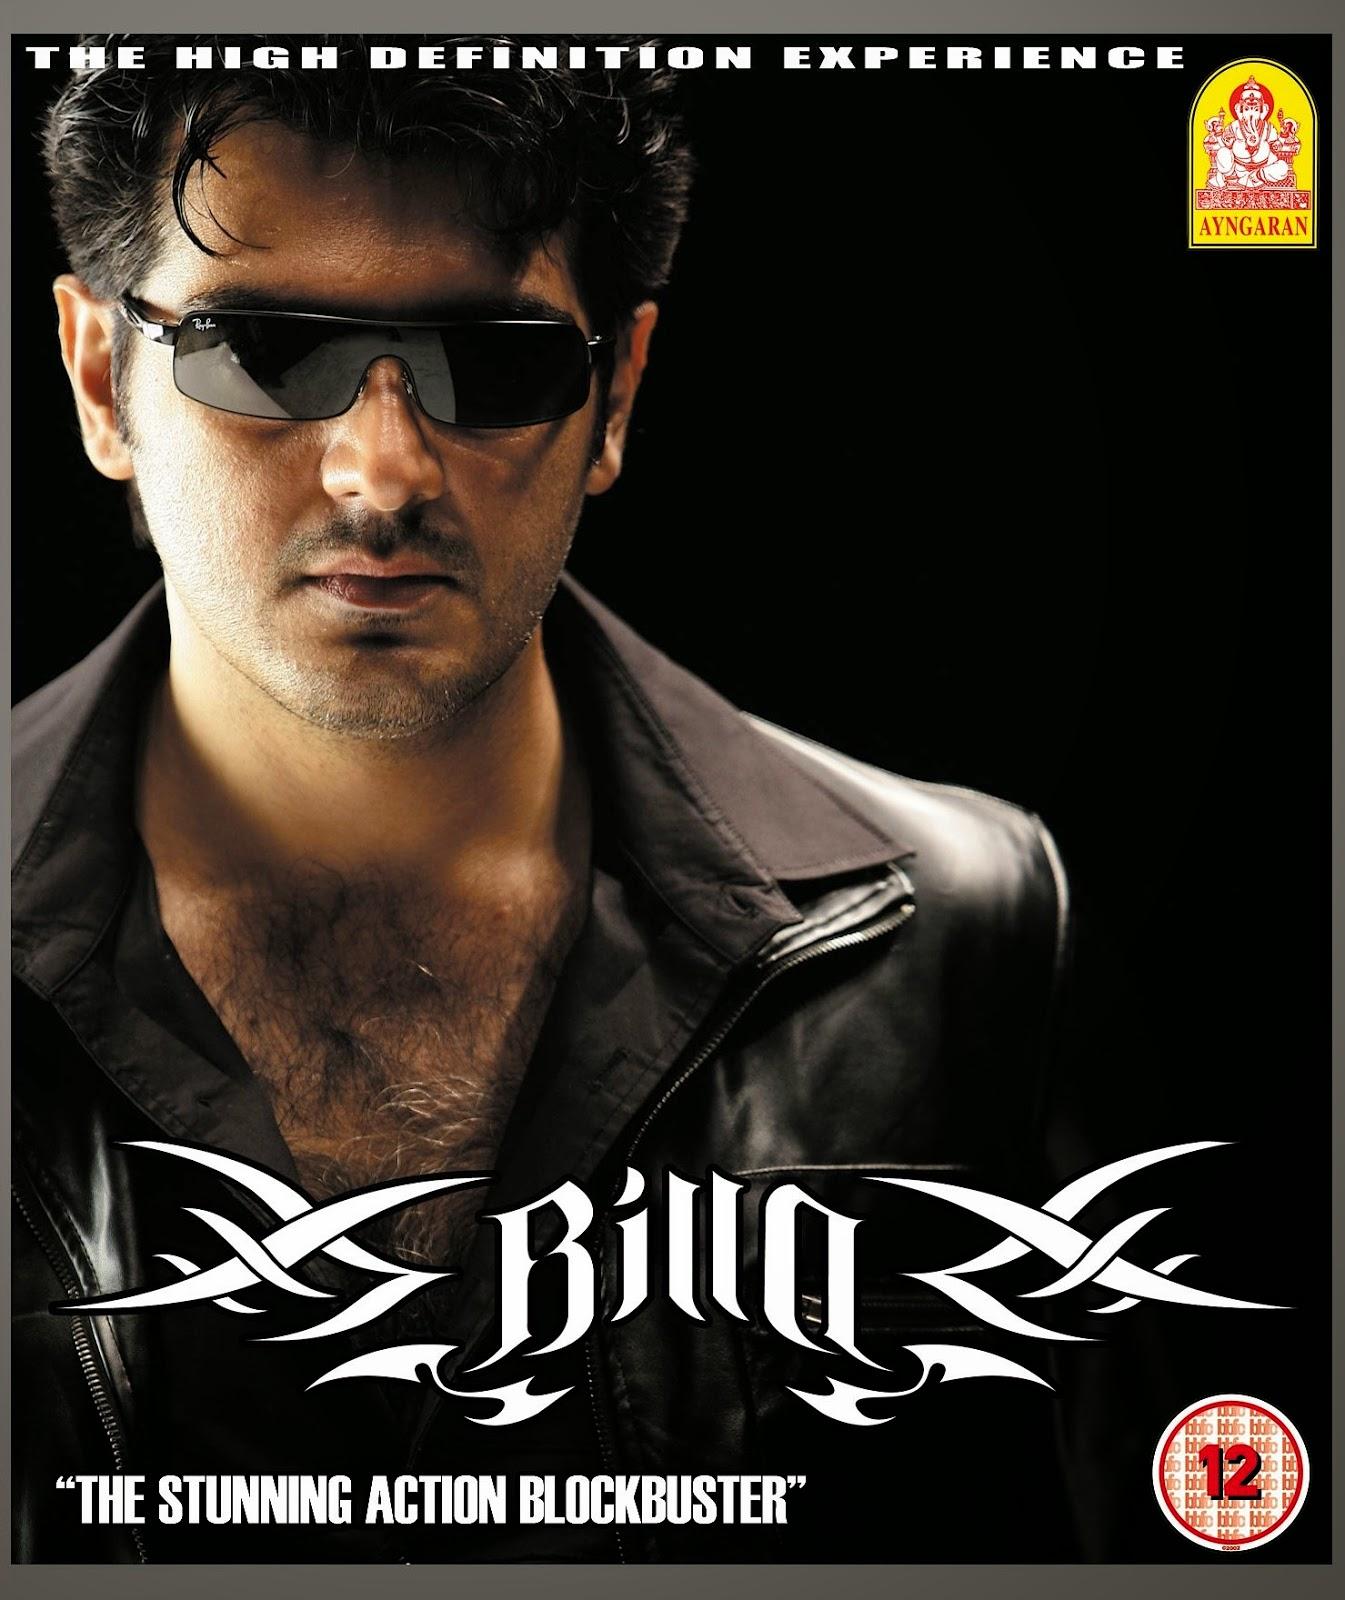 Ajith full movie name list : Close range trailer reaction